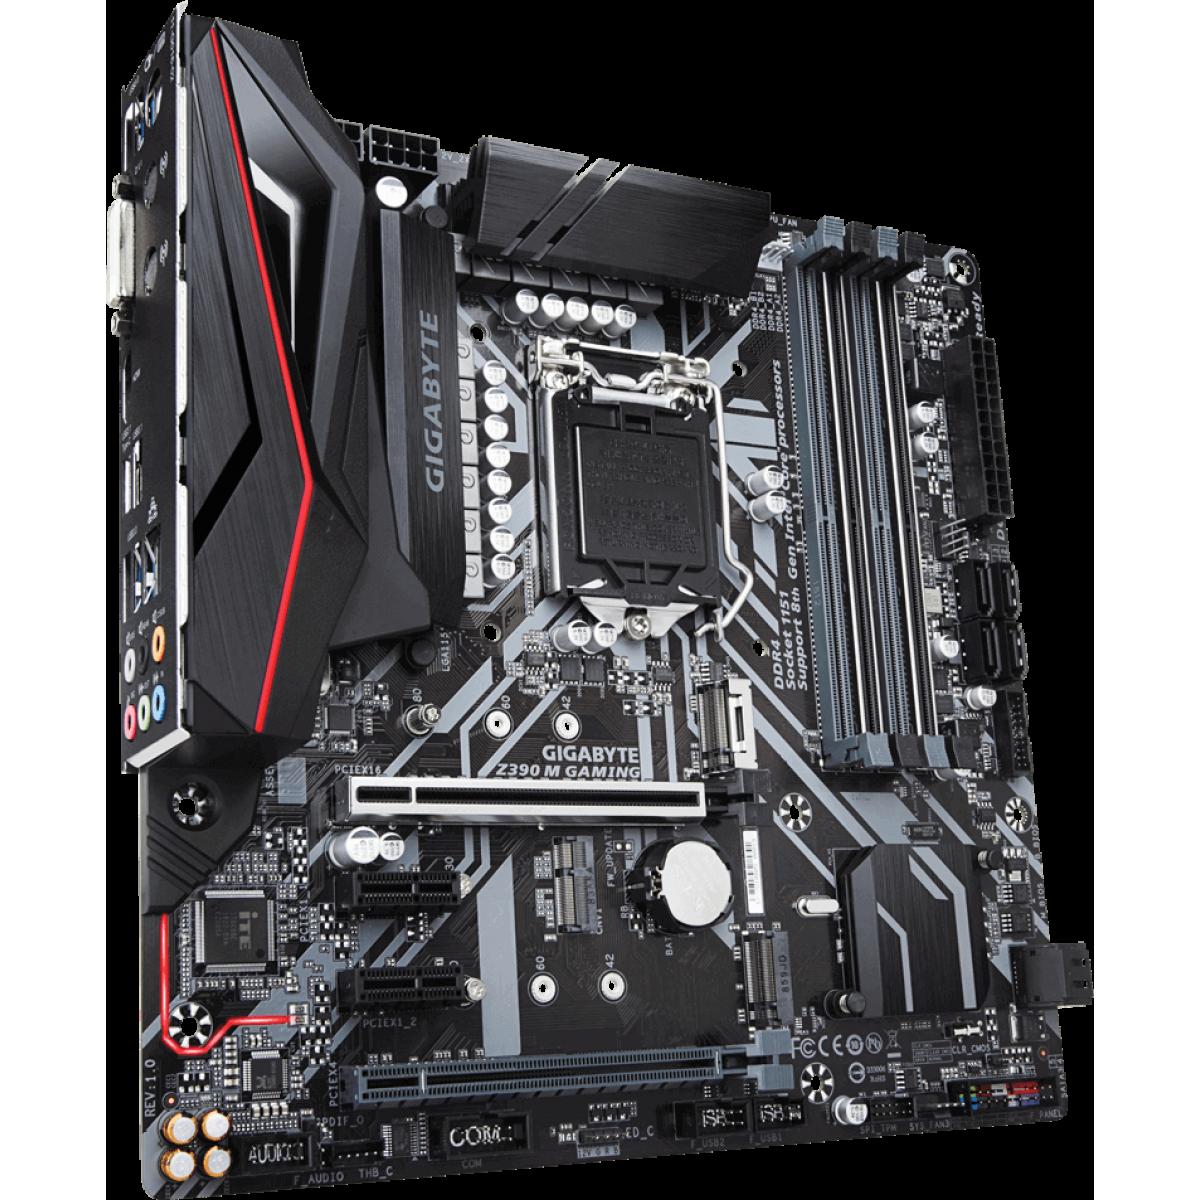 Placa Mãe Gigabyte Z390 M GAMING, Chipset Z390, Intel LGA 1151, mATX, DDR4